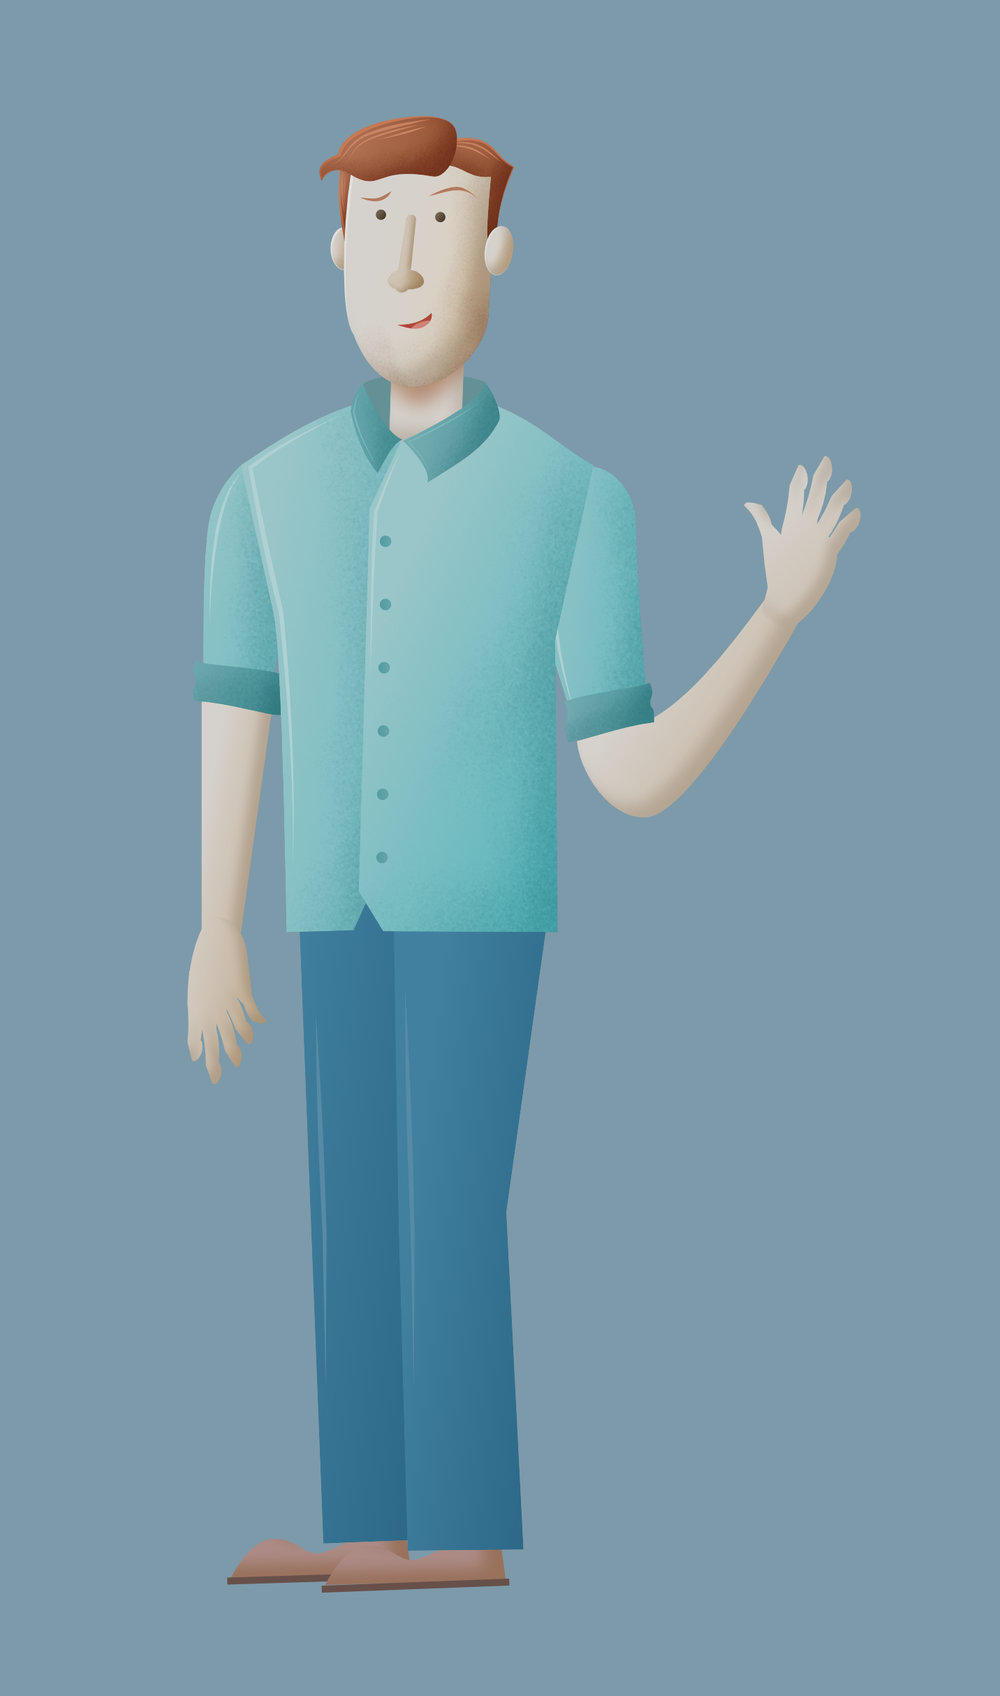 character design_ginger man akward no beard.jpg